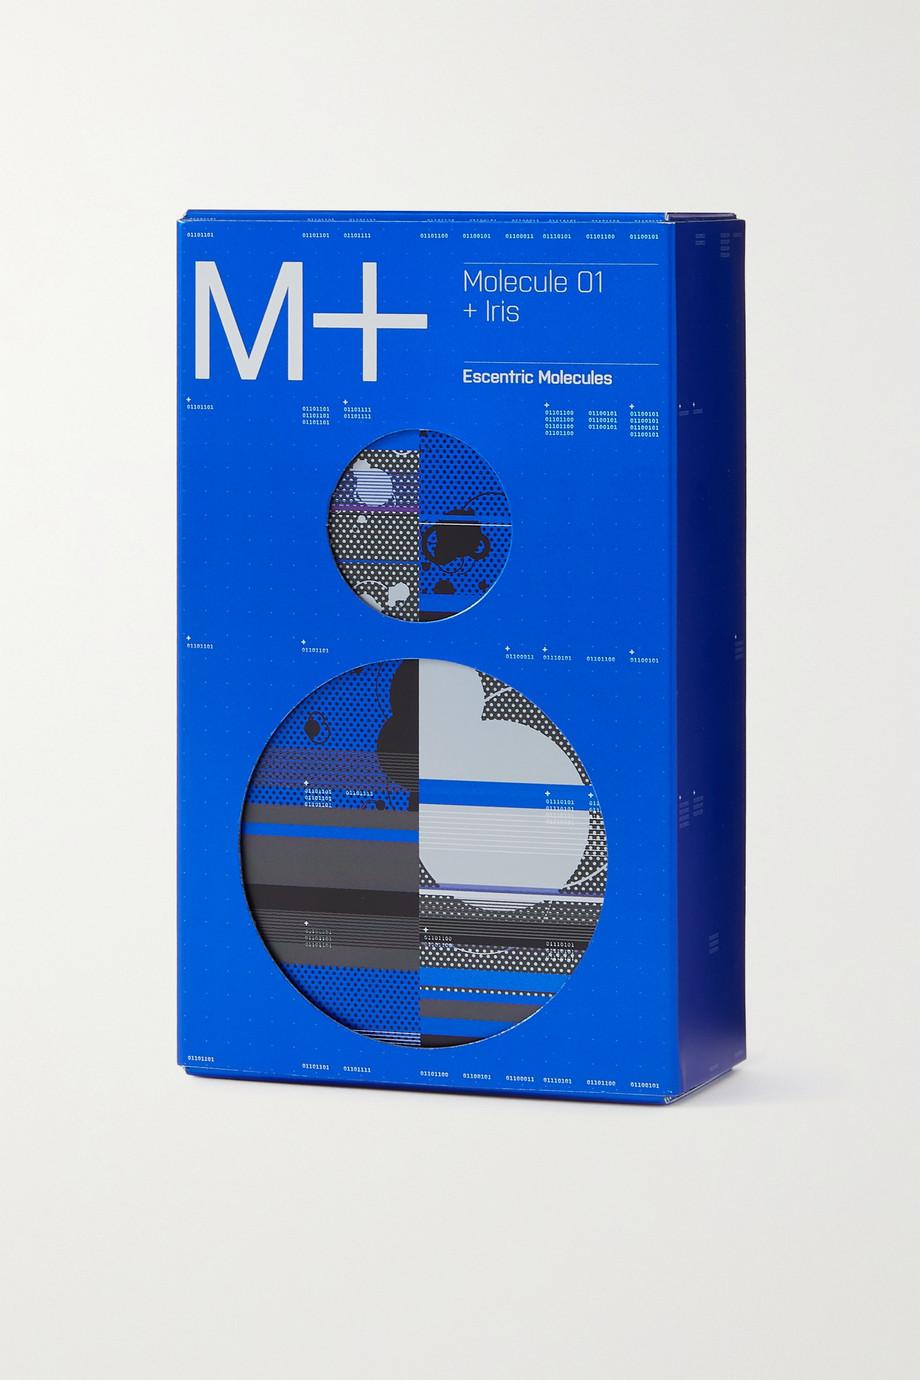 Escentric Molecules Eau de toilette Molecule 01 + Iris, 100 ml